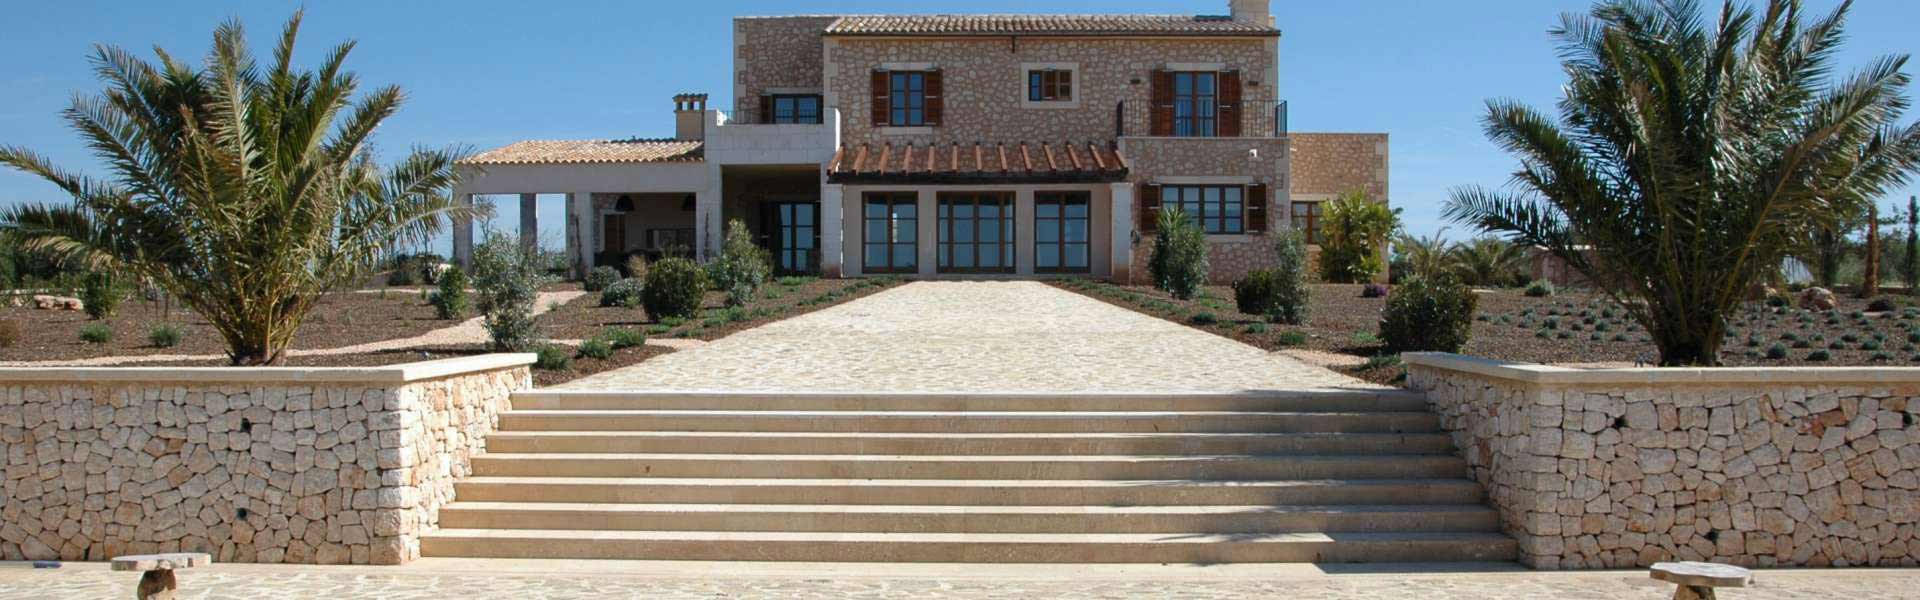 Montemar Immobilien Mallorca - Neubau Traumvilla bauen